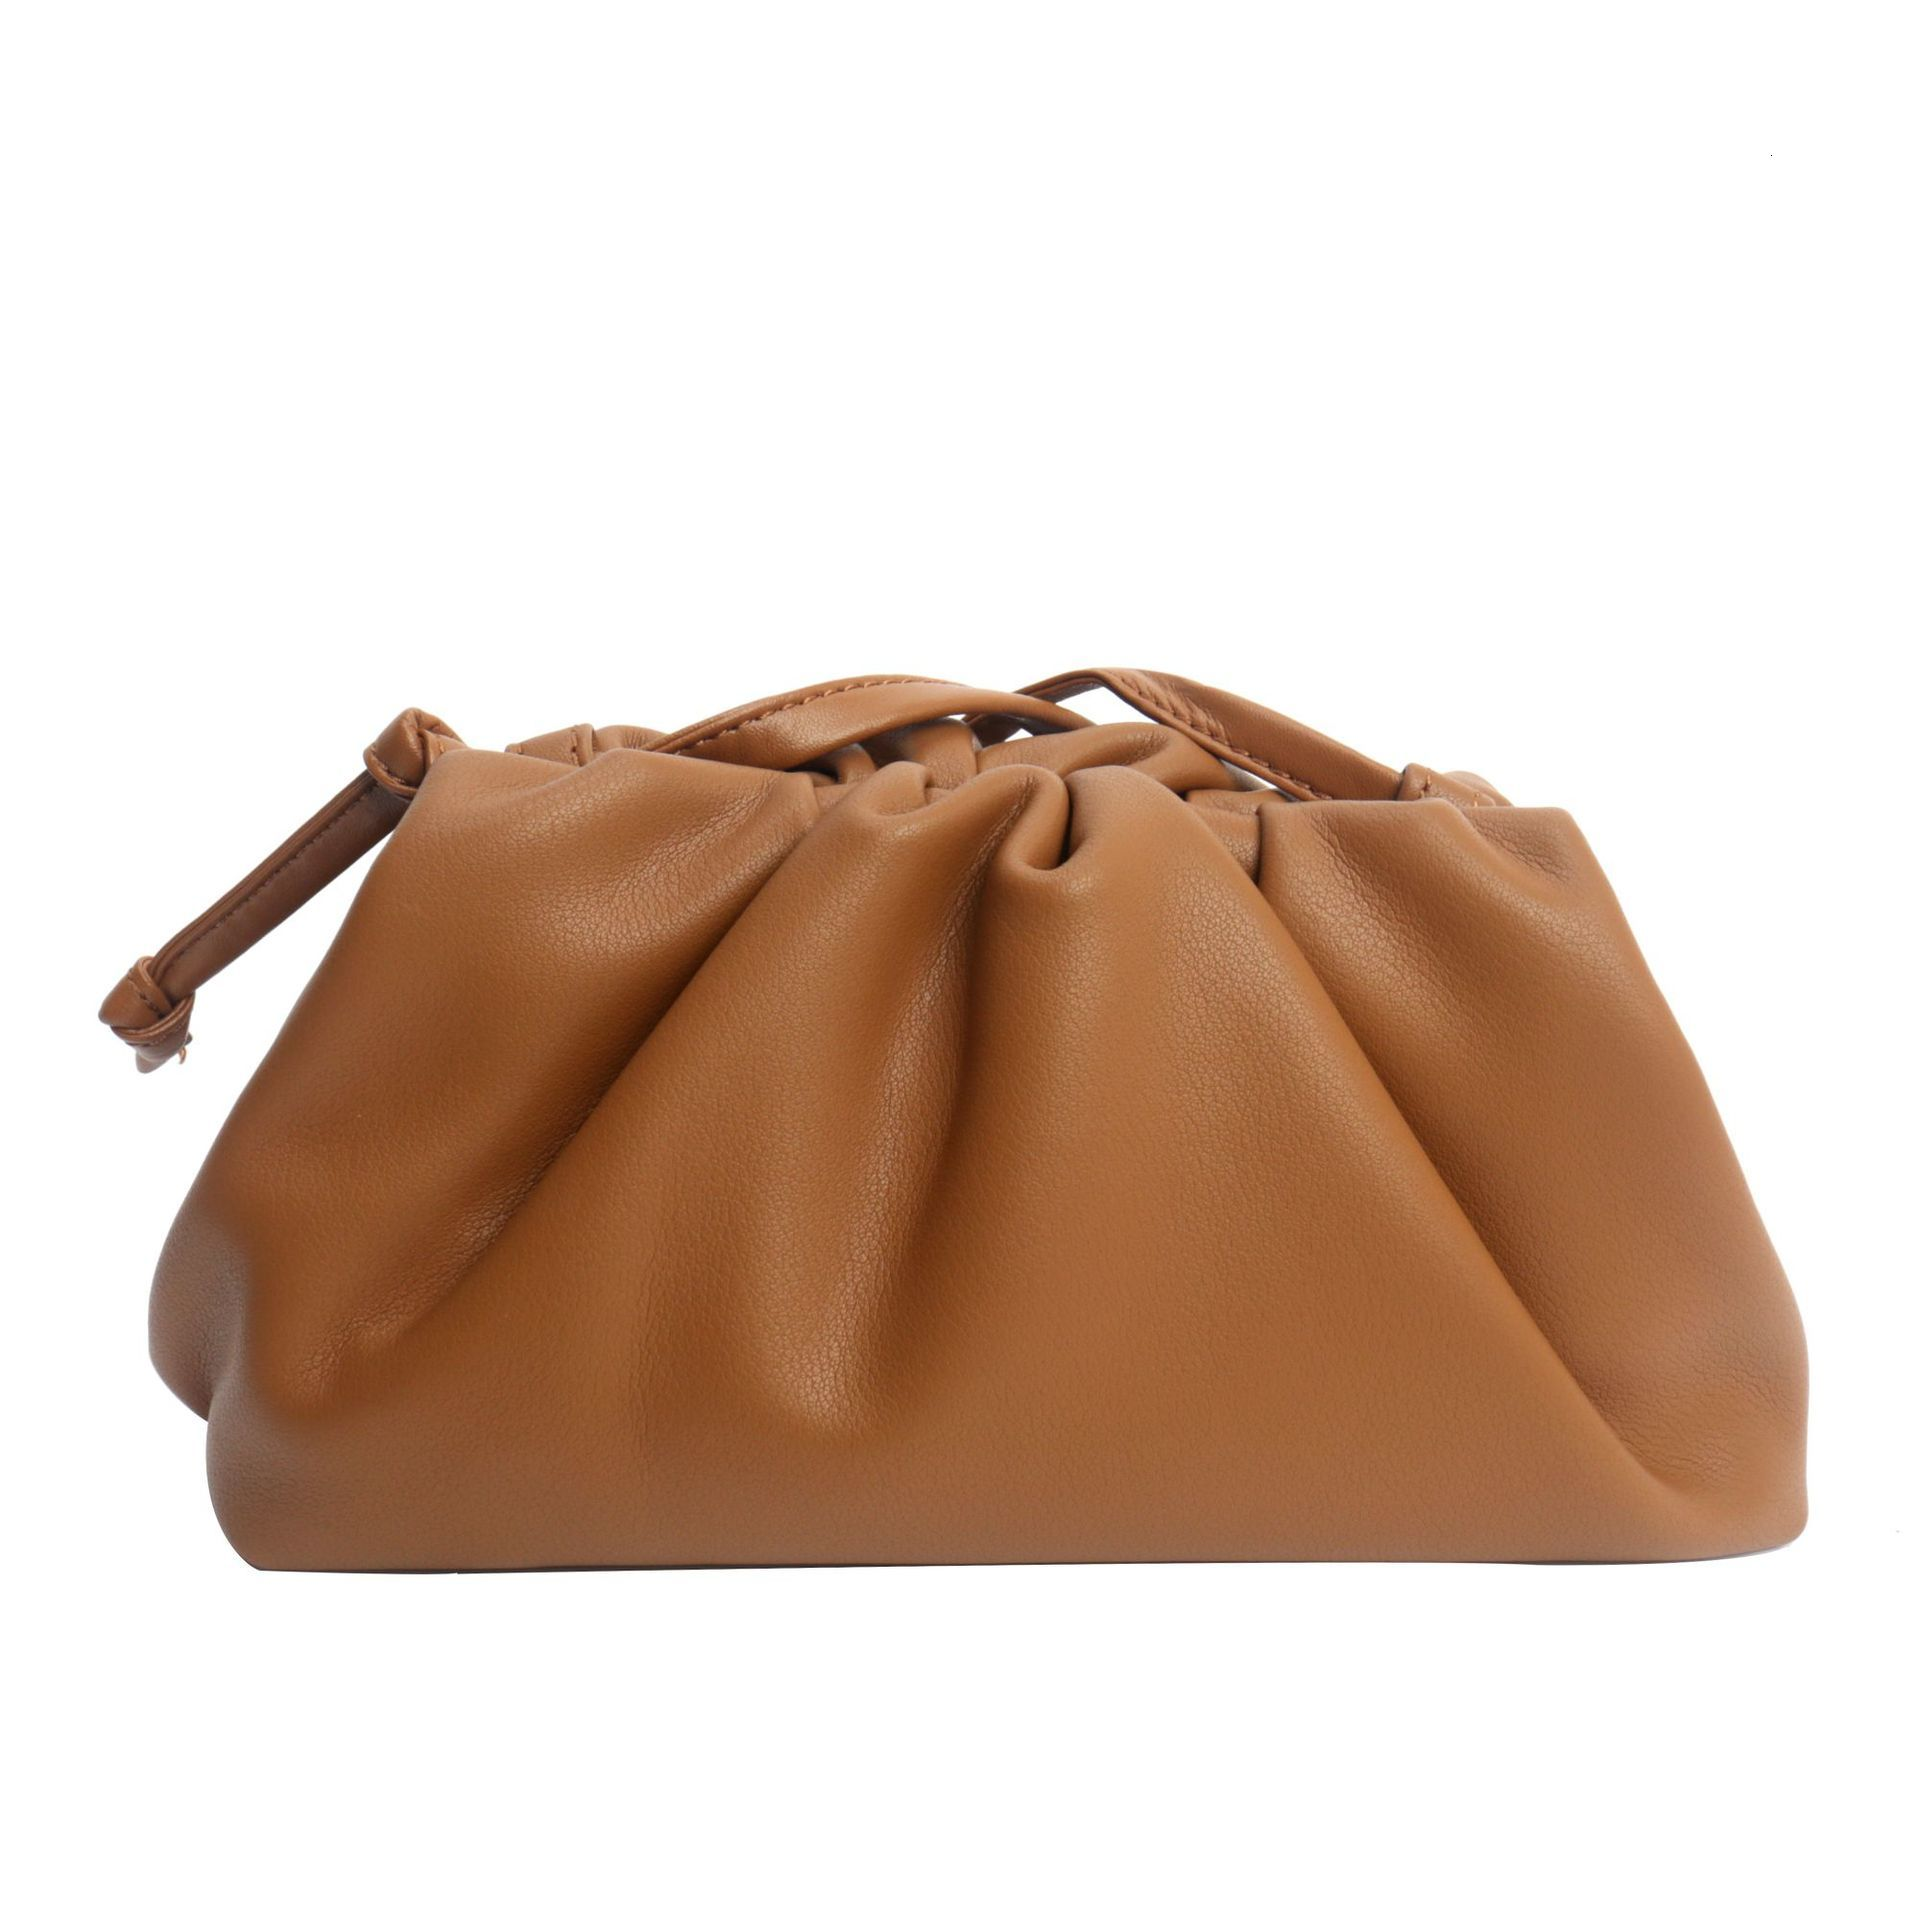 Cloud Bag Genuine Leather Women Bags